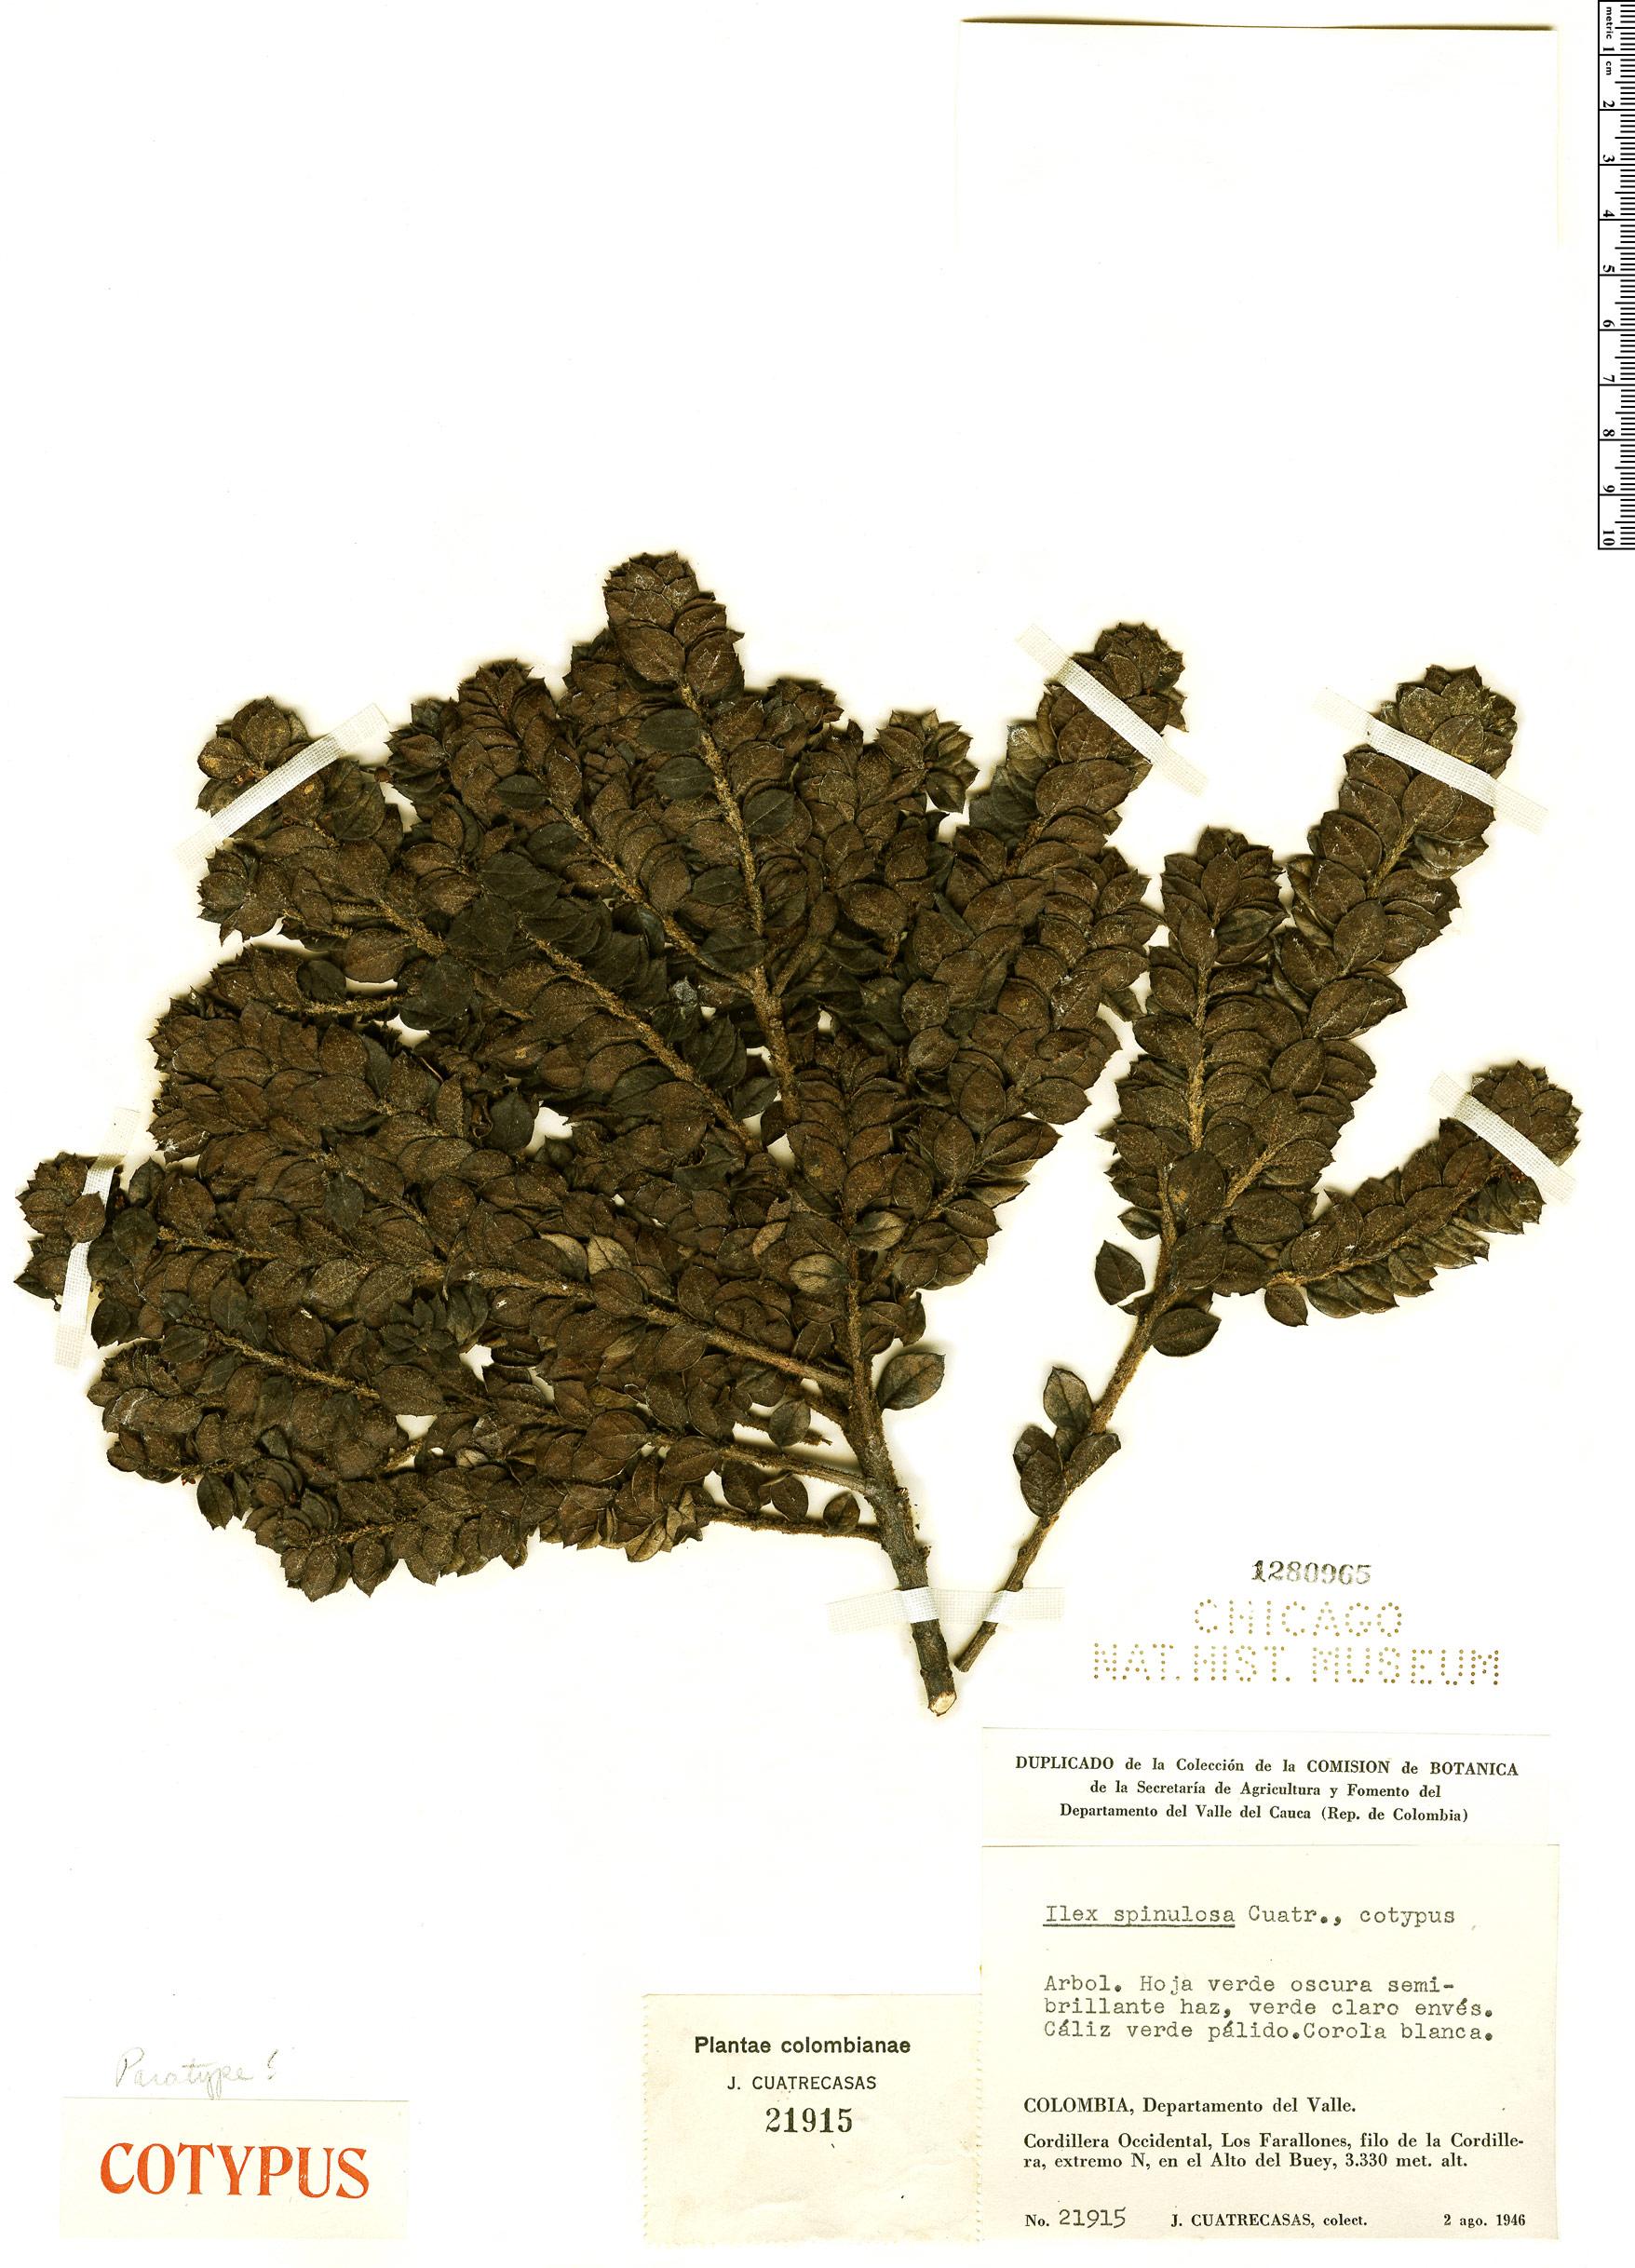 Specimen: Ilex spinulosa